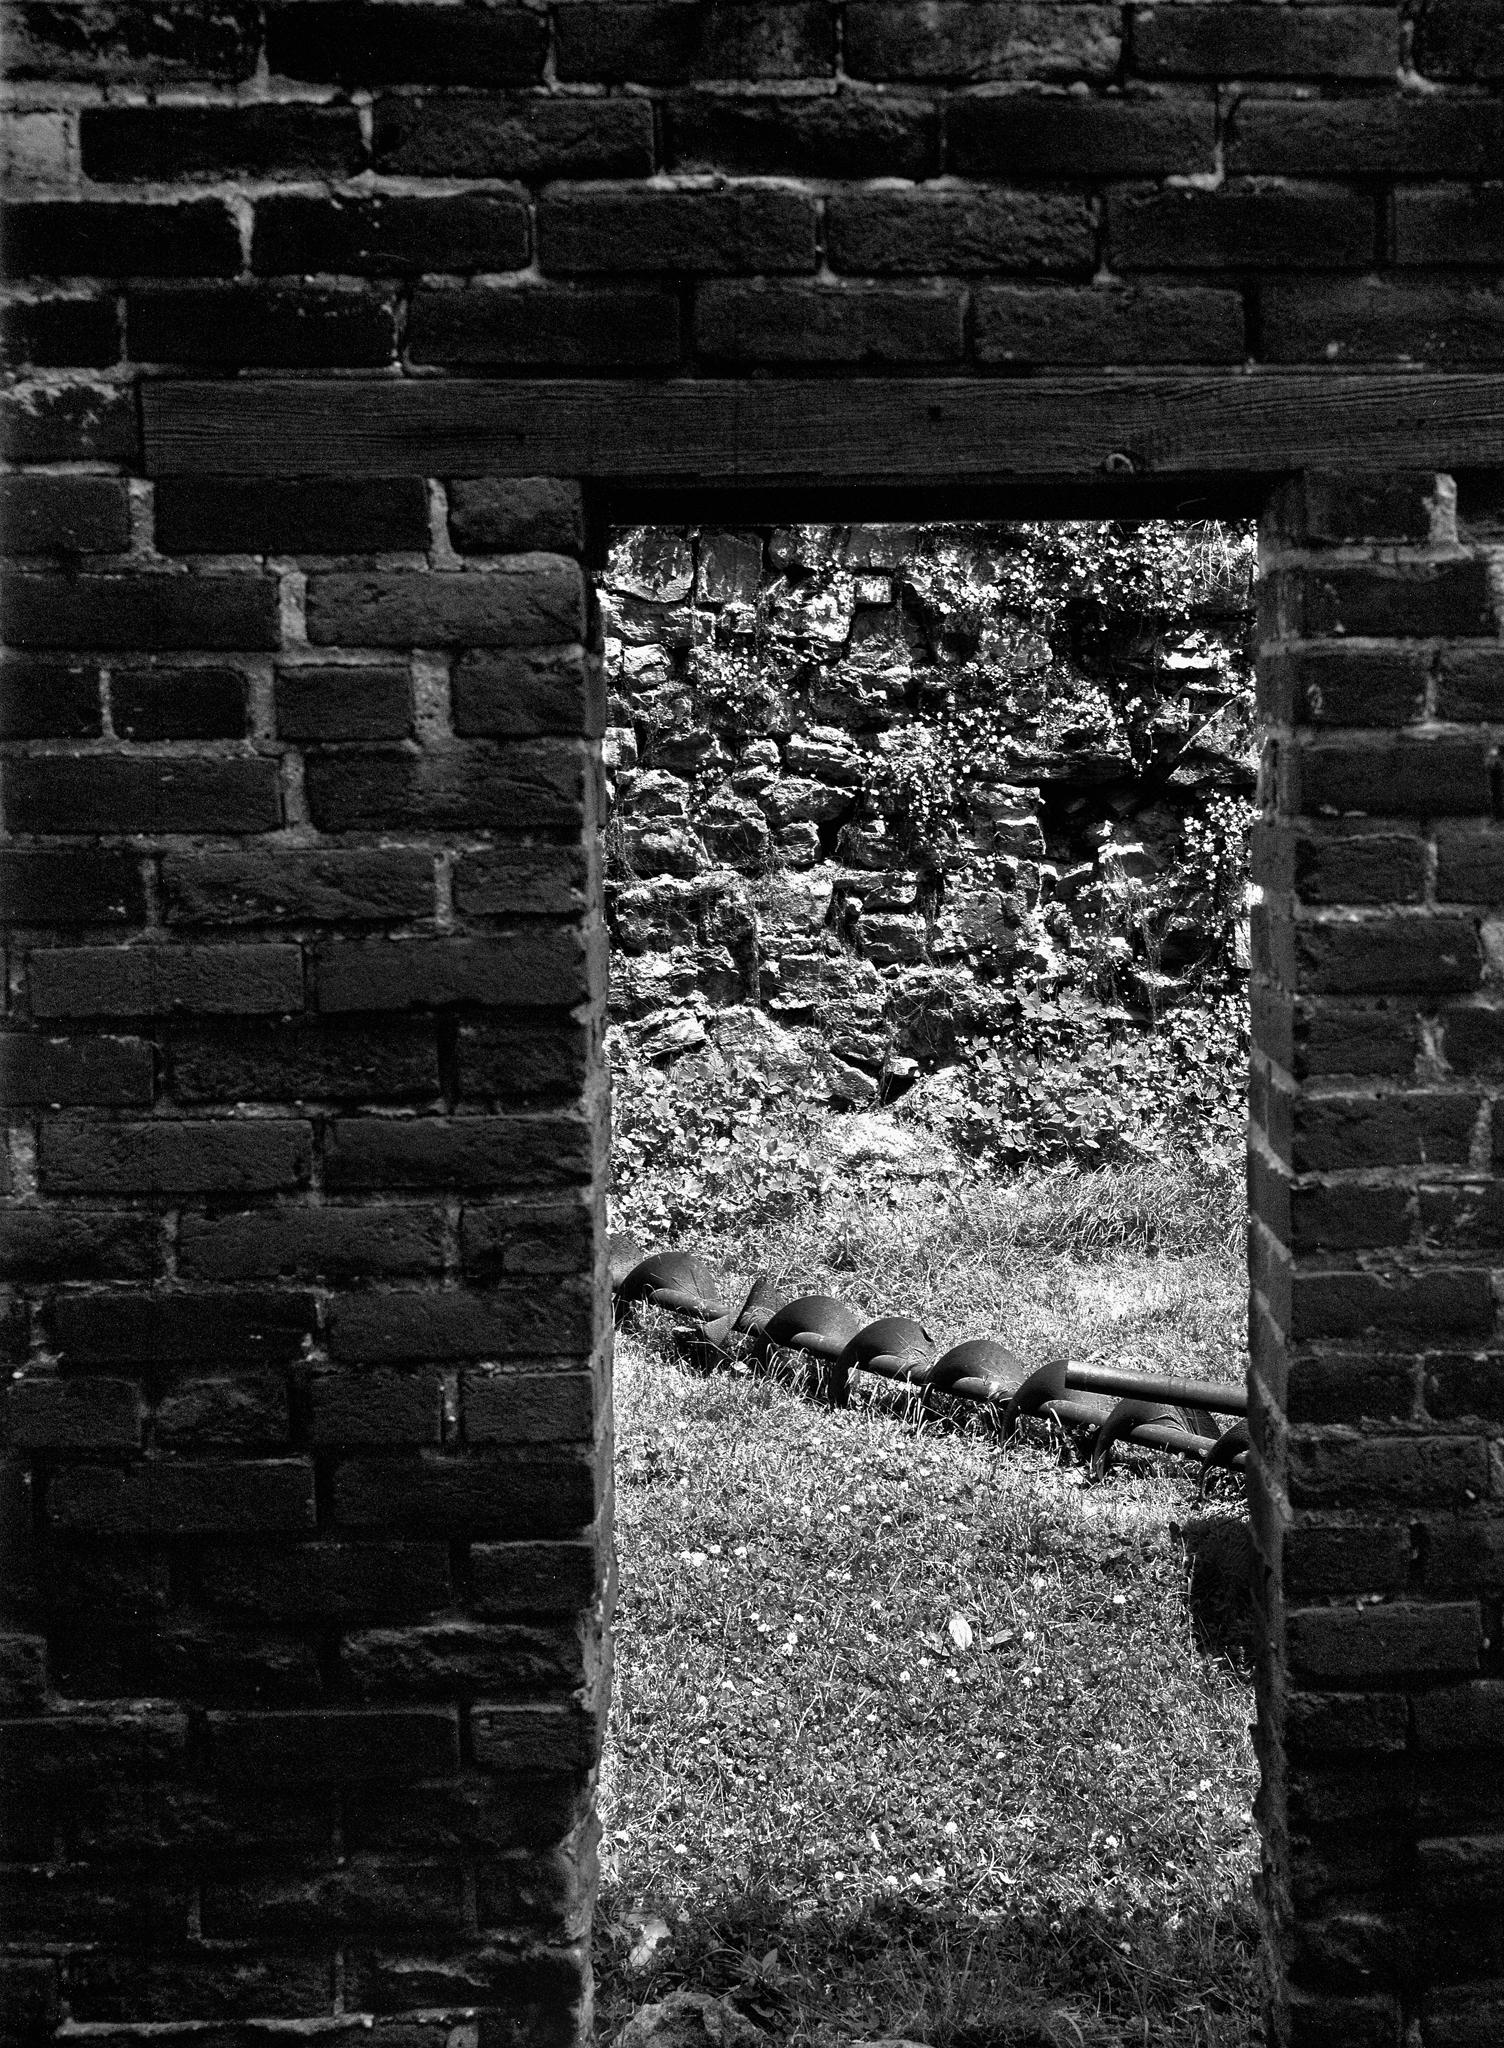 4x5_for_365_project_0160_Bethlehem_HD_brick_wall_and_screw.jpg